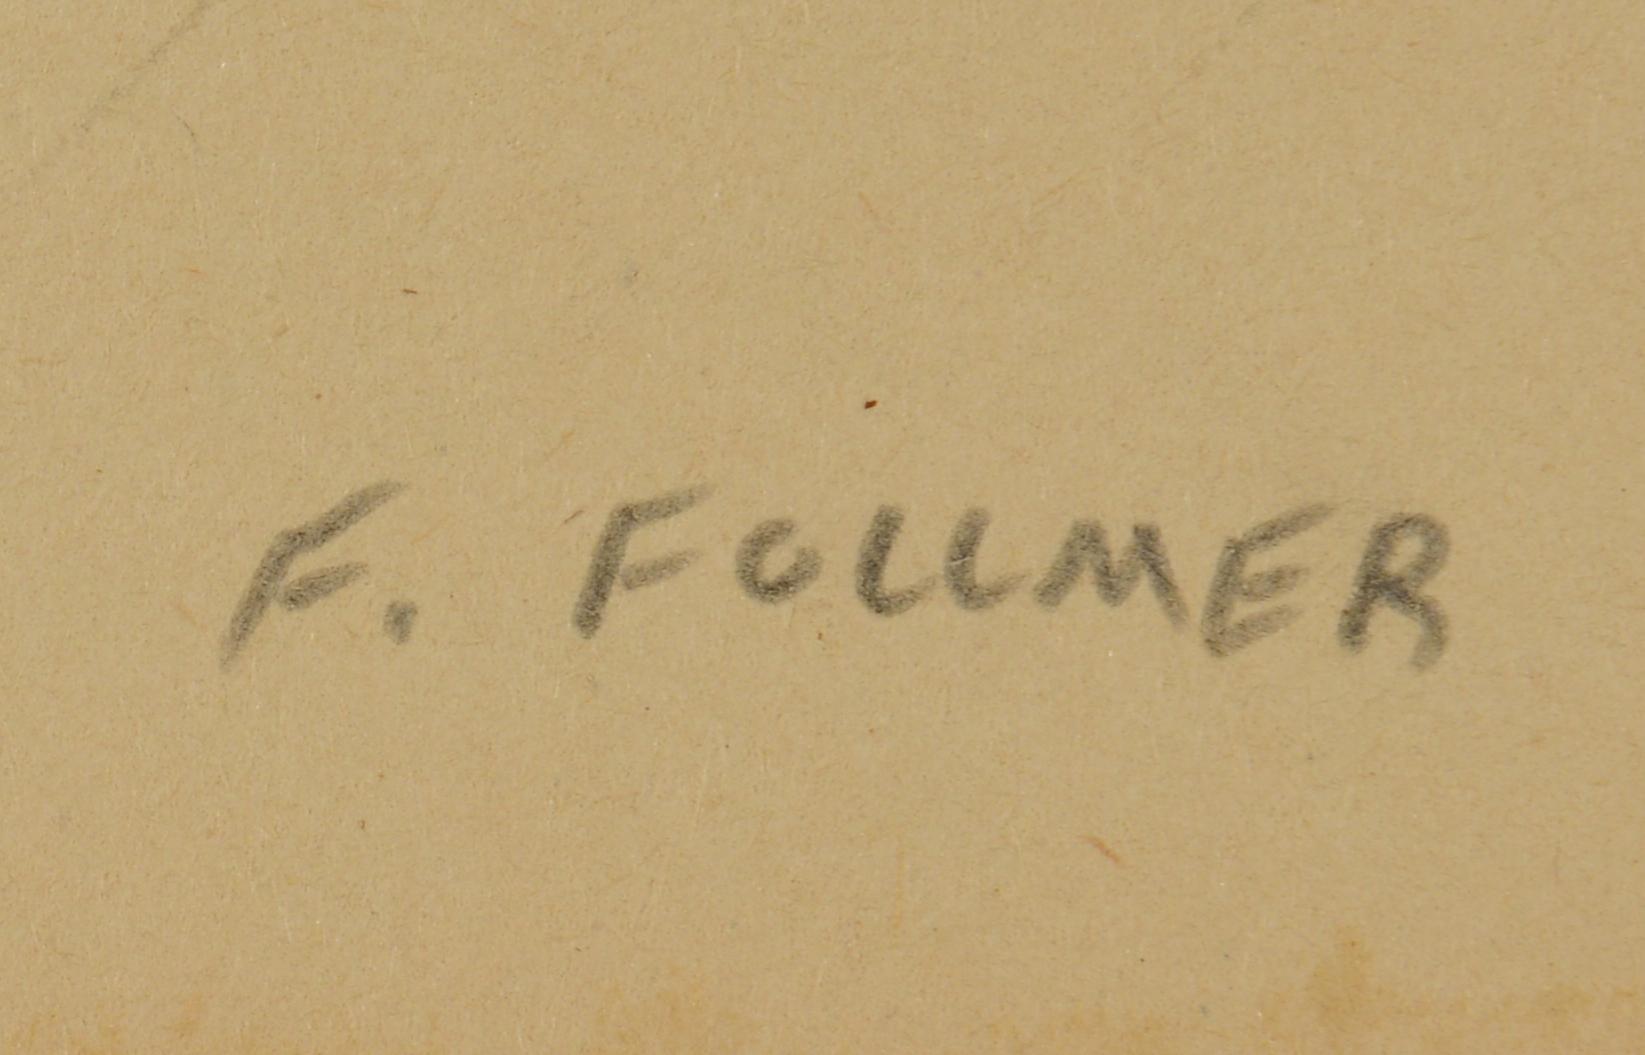 Lot 3088315: F. Follmer, 2 Snow White Drawings